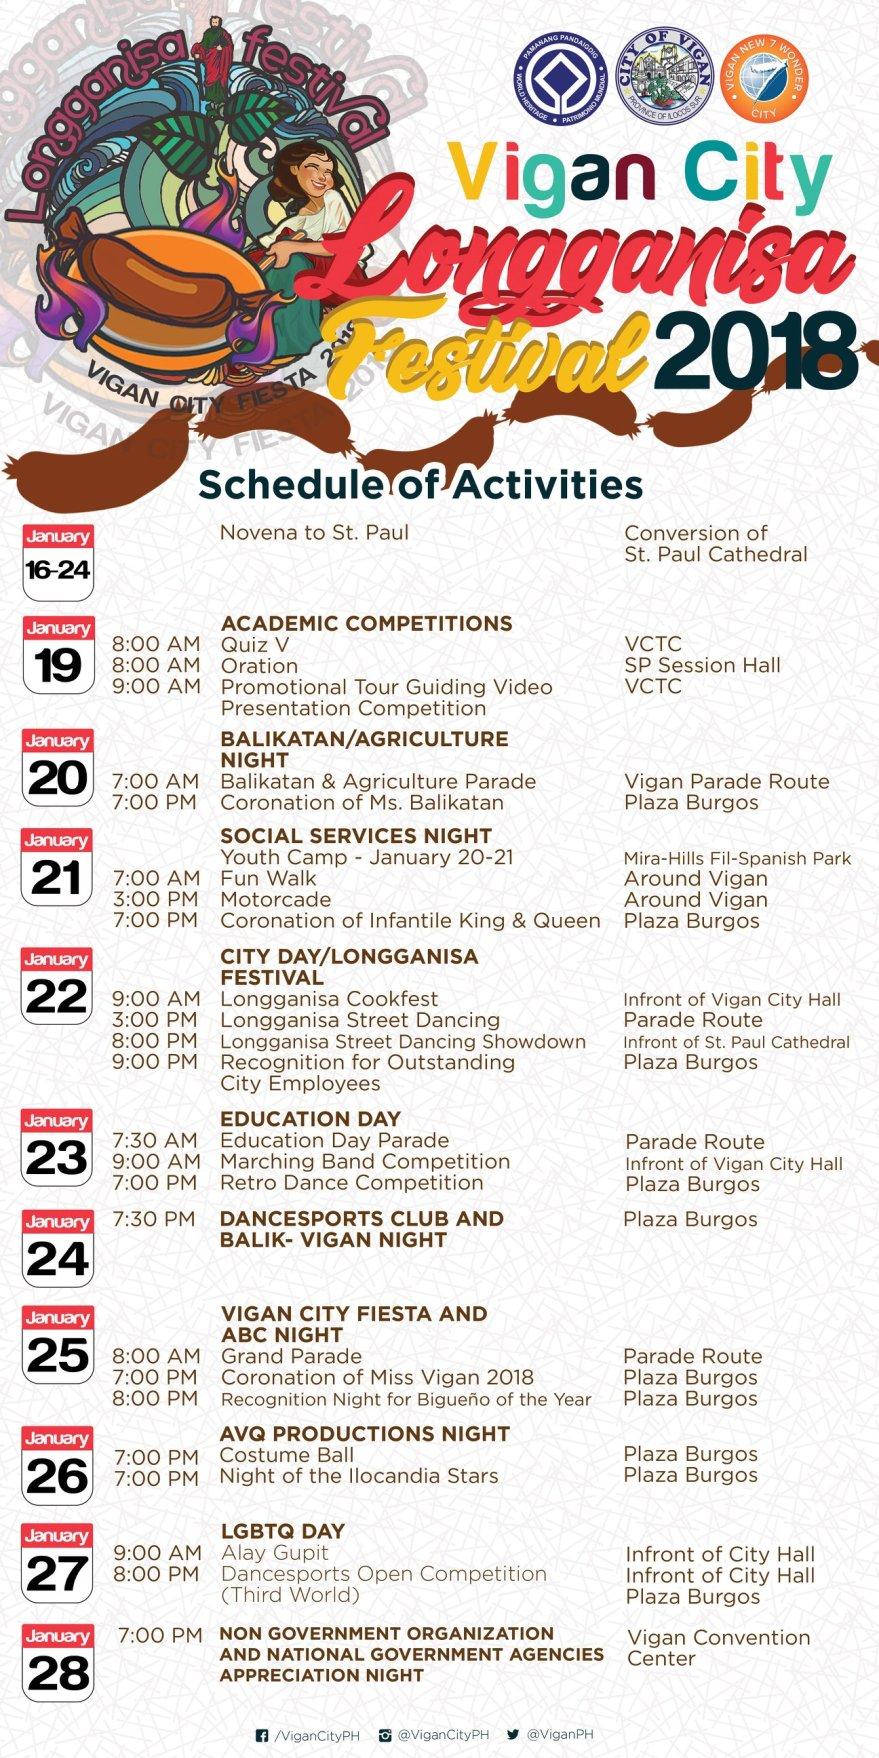 Vigan City kicks off fiesta calendar with Longganisa Festival 2018